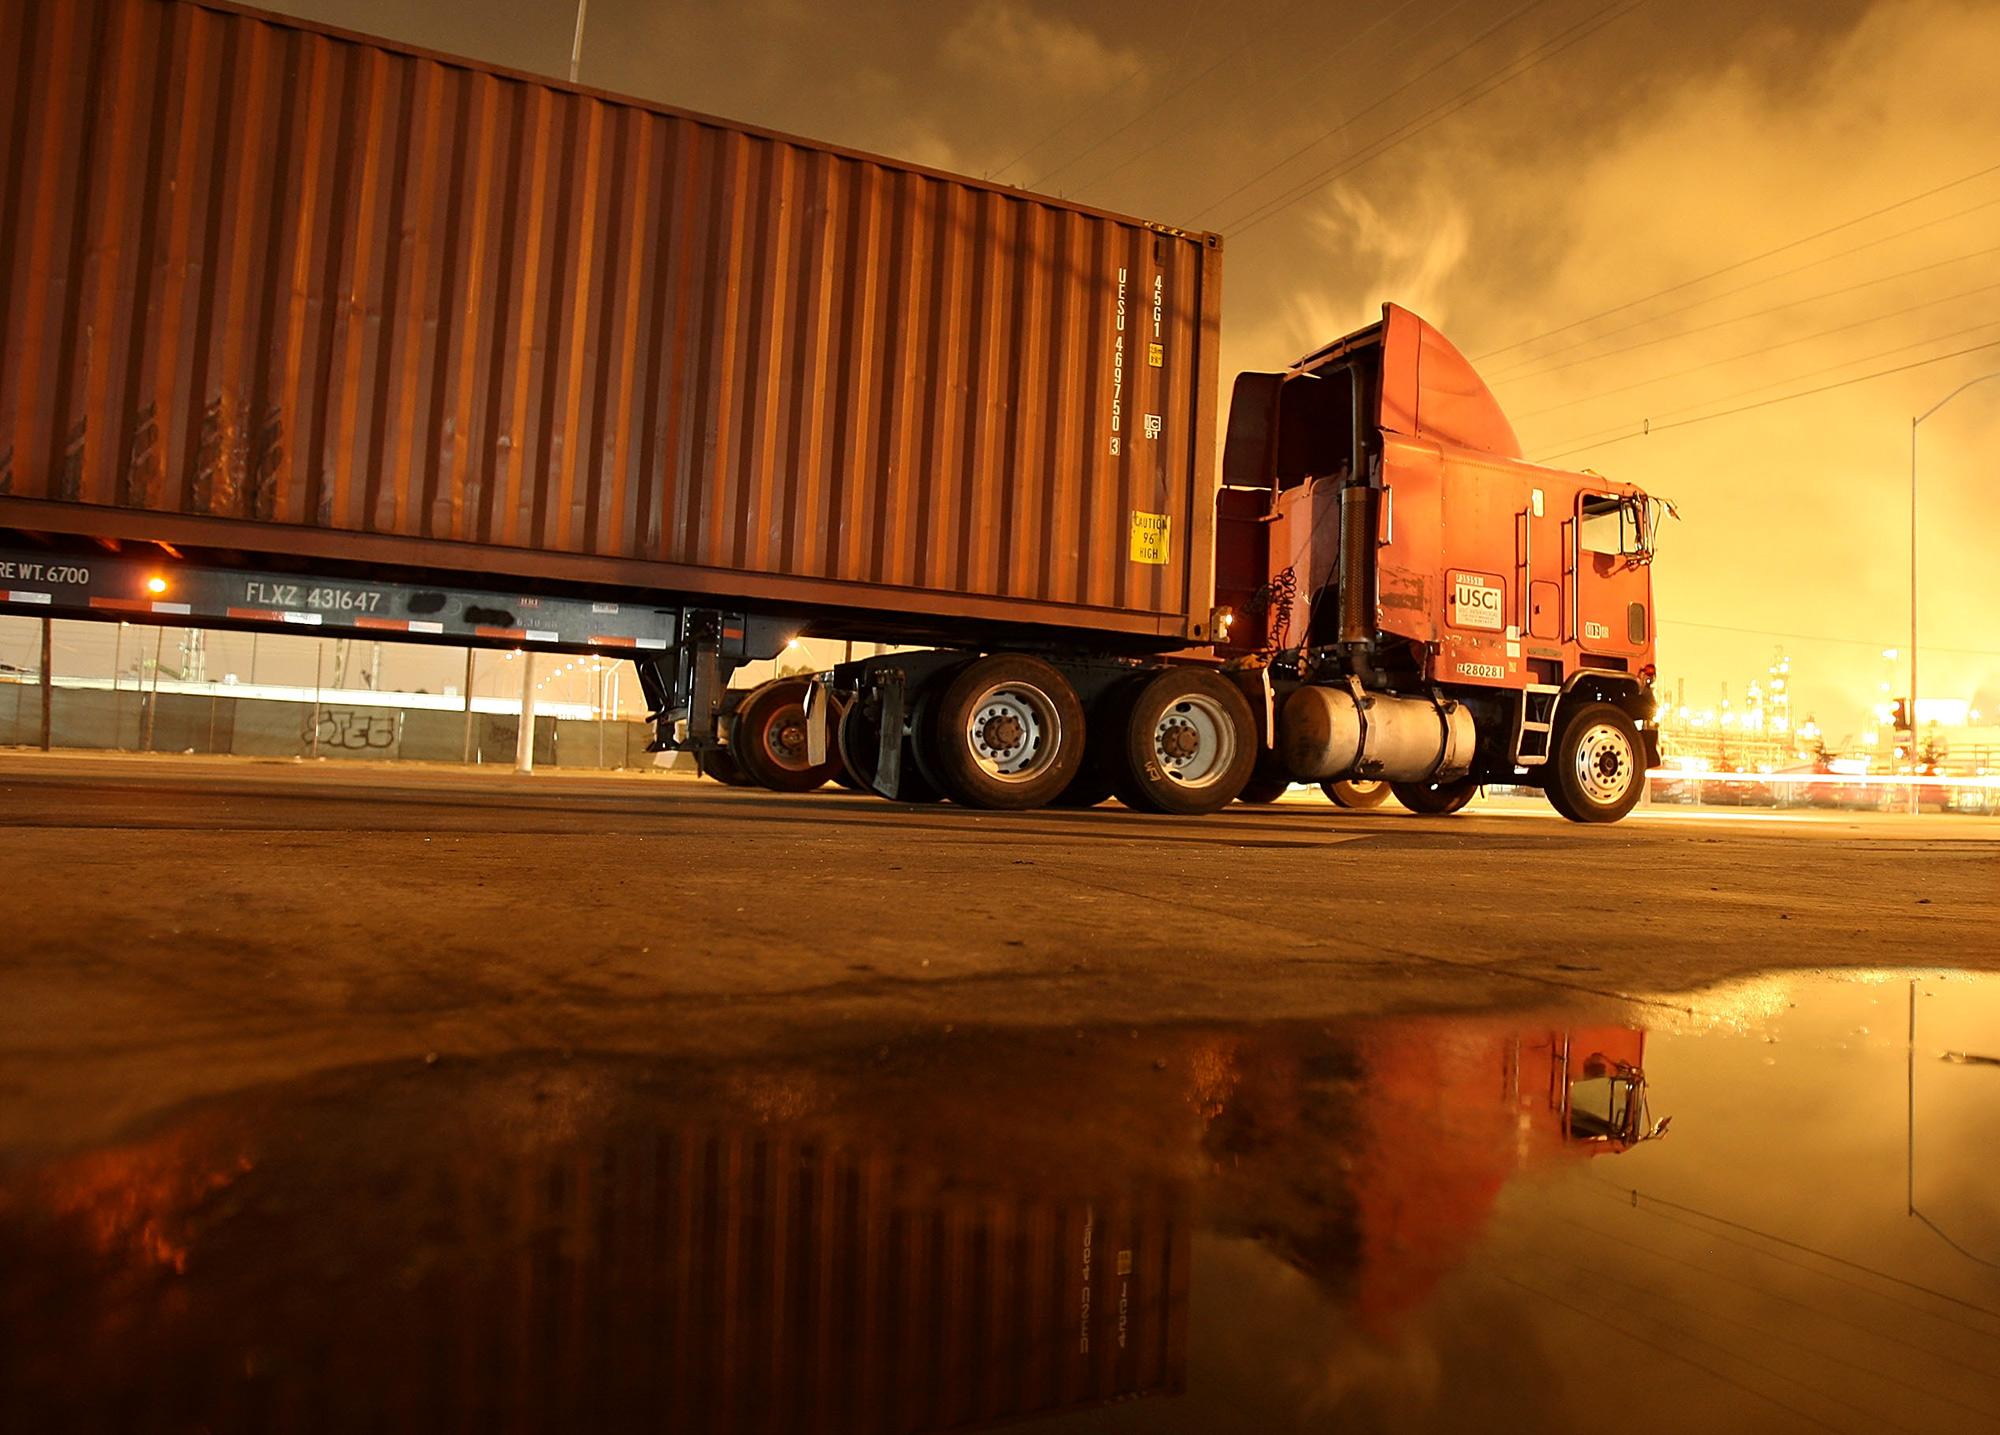 We Bleed Diesel Truckers Nearing Worst Price Shock Since 2008 Freight Truck Fuel Pump Bloomberg